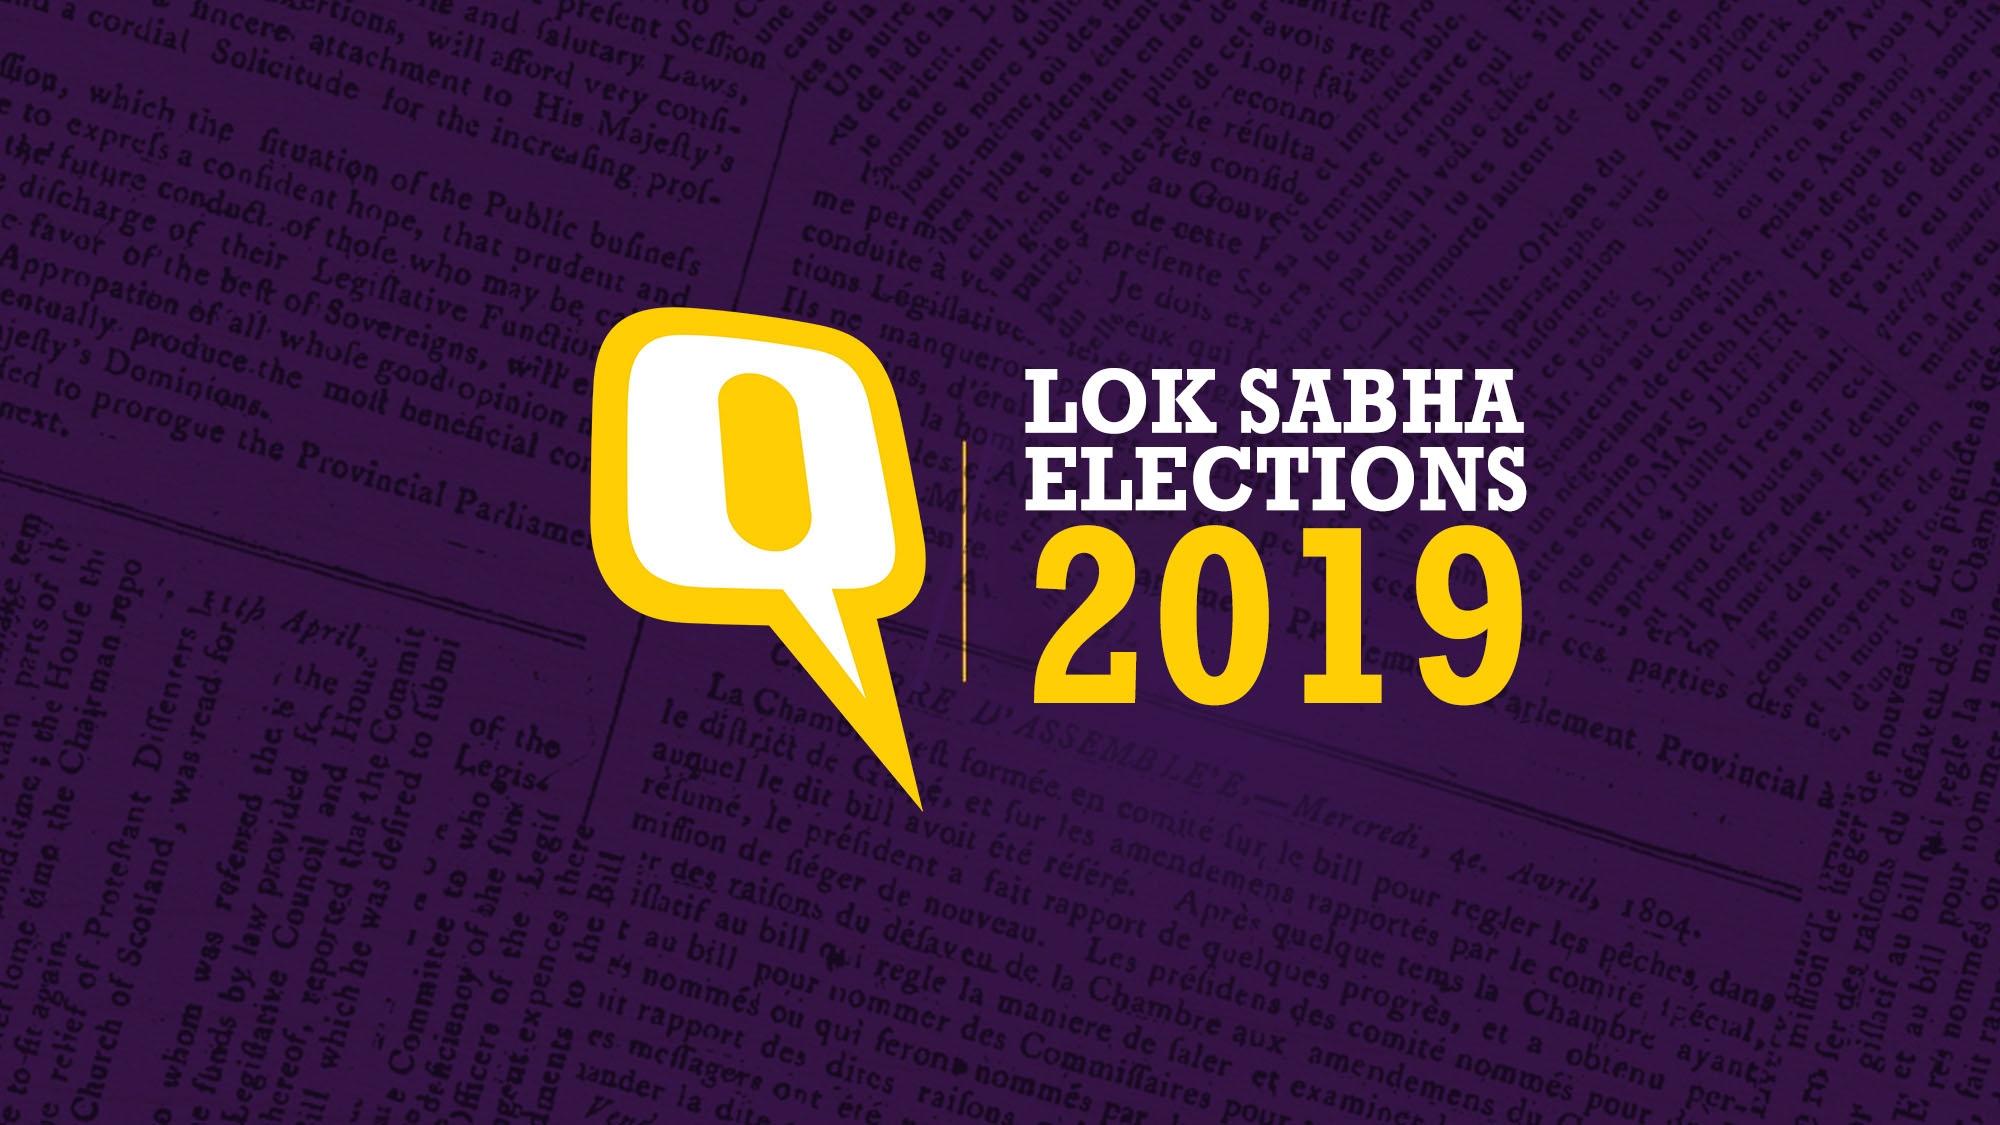 Elections 2019: Sonia Gandhi Writes to People of Rae Bareli